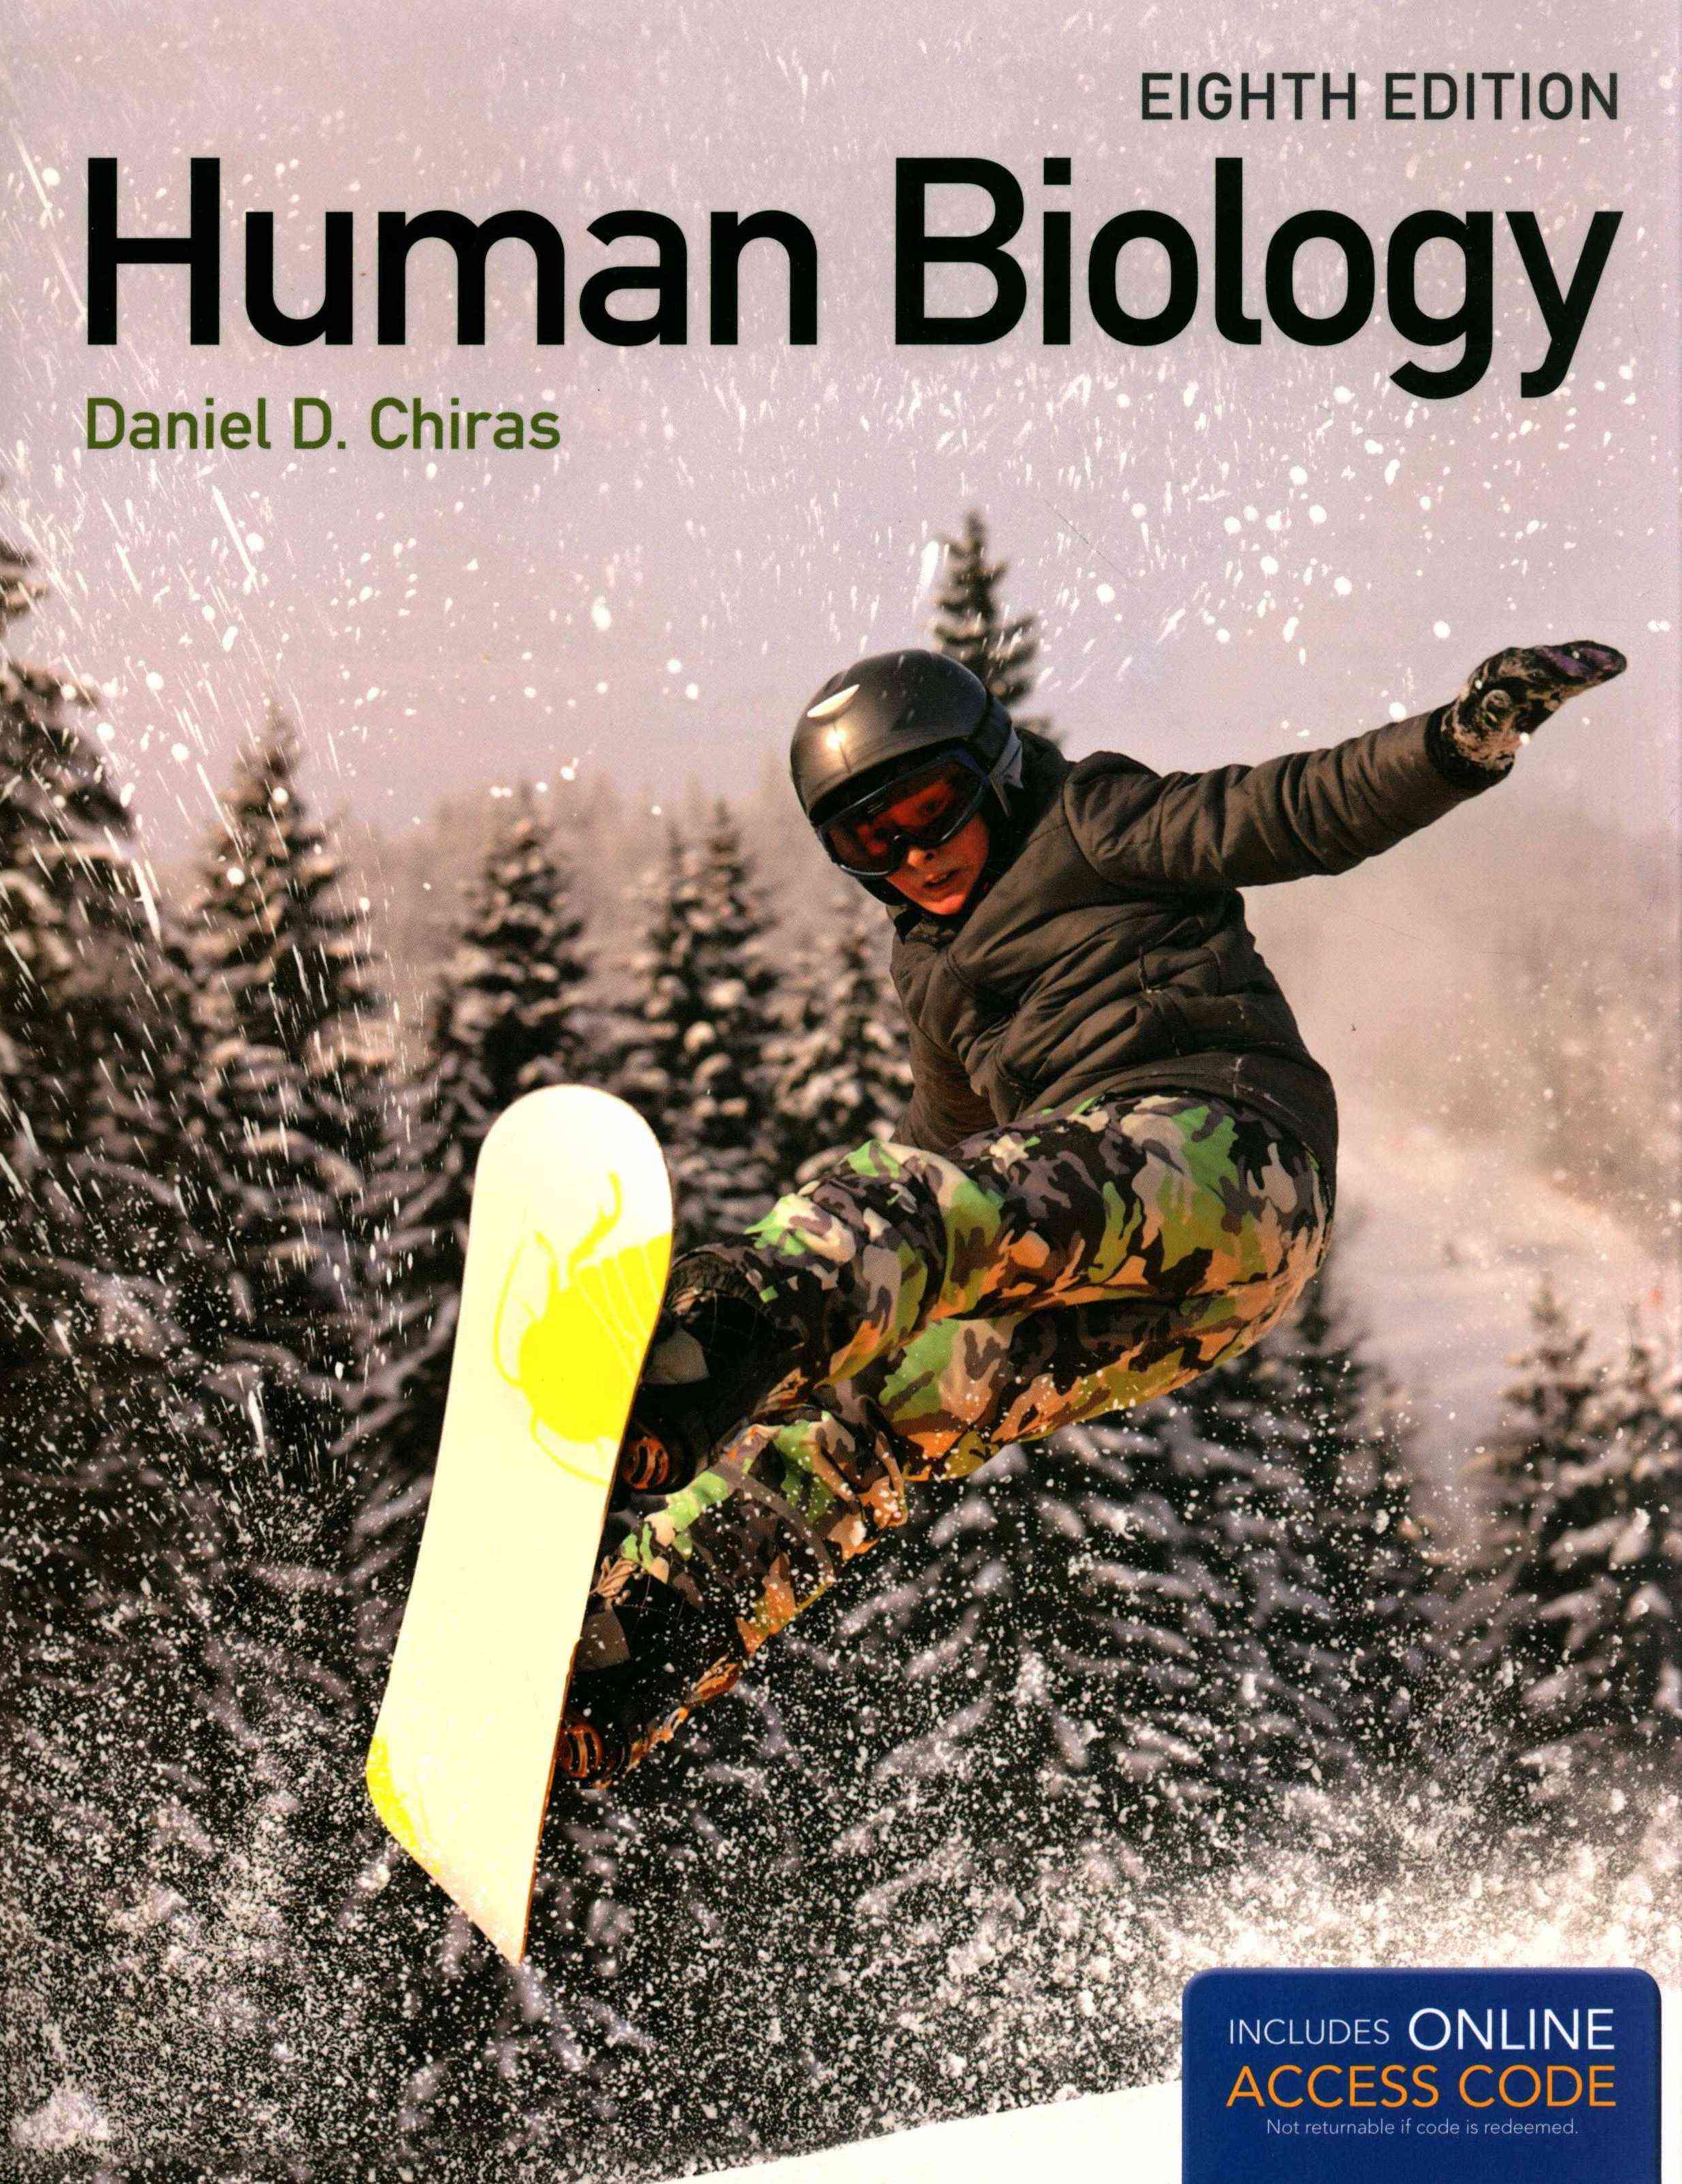 Human Biology By Chiras, Daniel D.